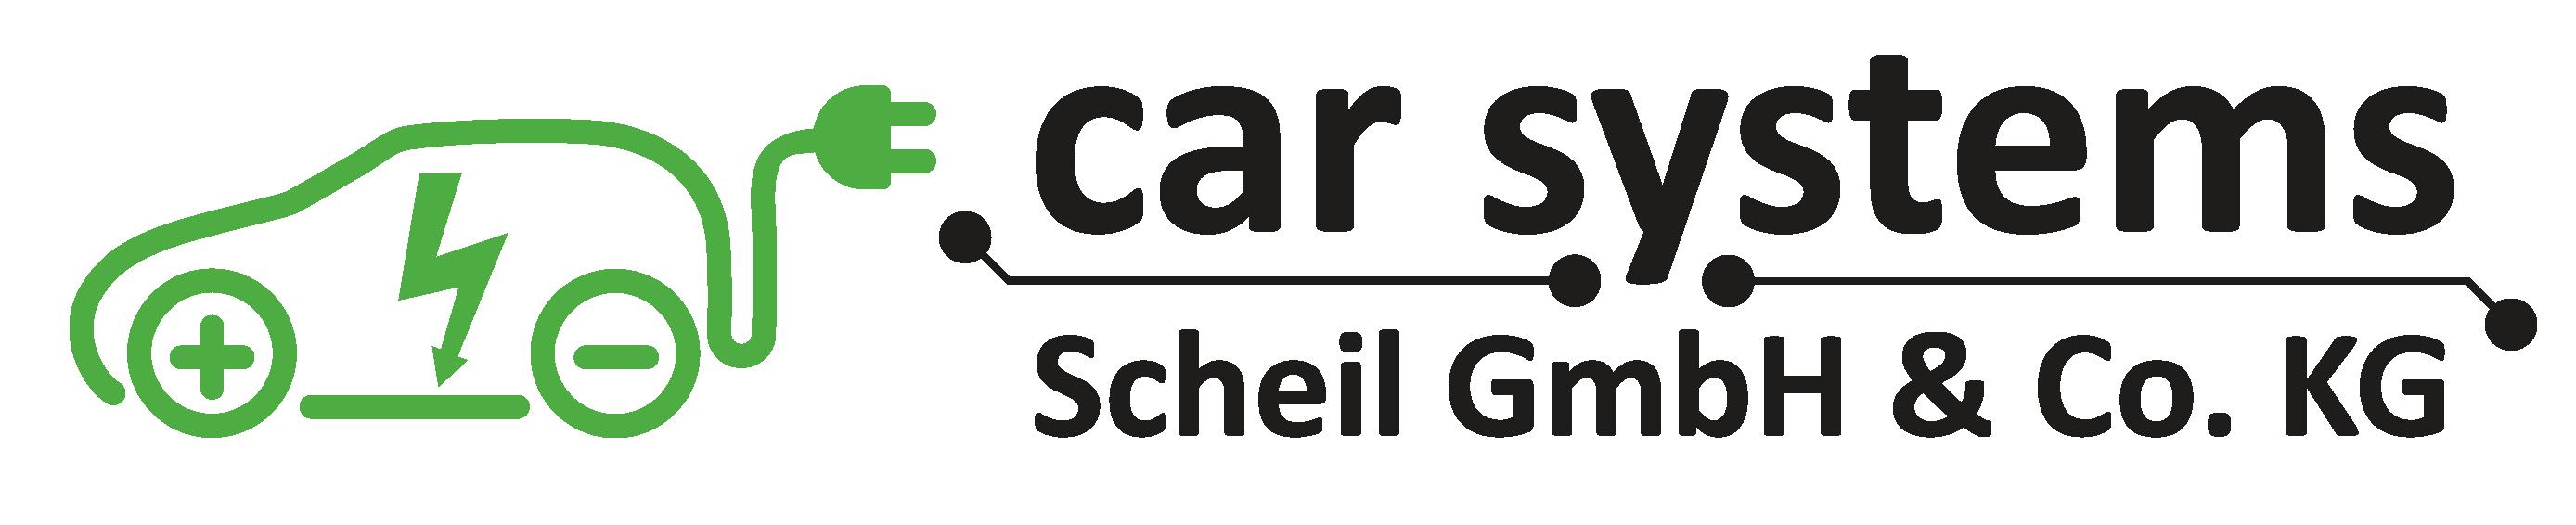 car systems Scheil GmbH & Co. KG